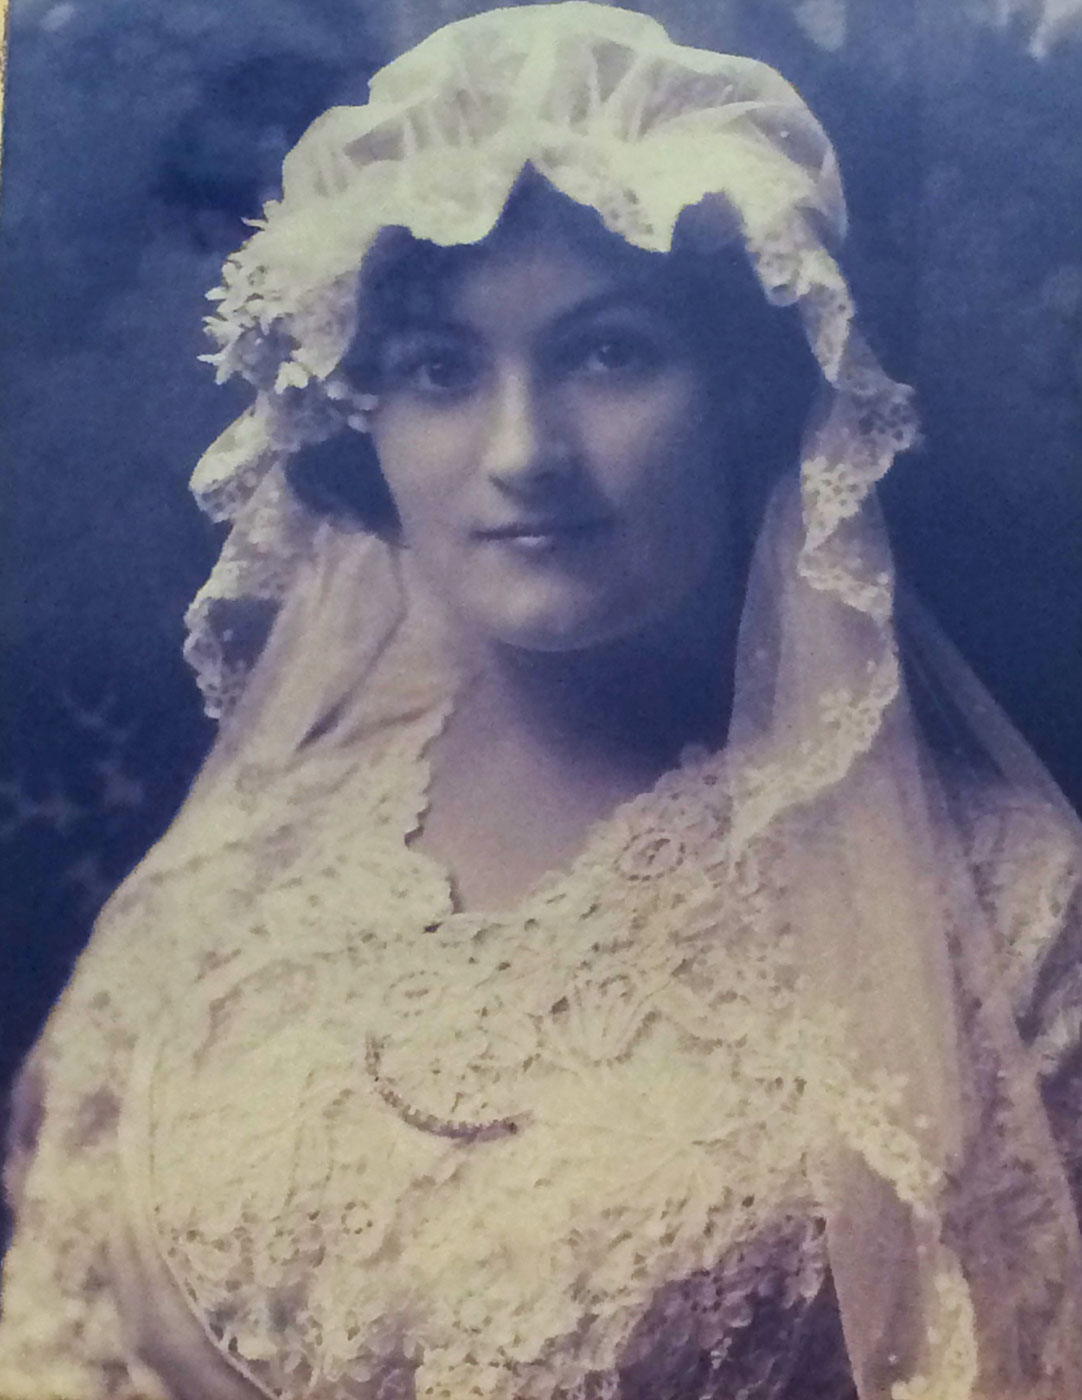 Irene Parks on her wedding day